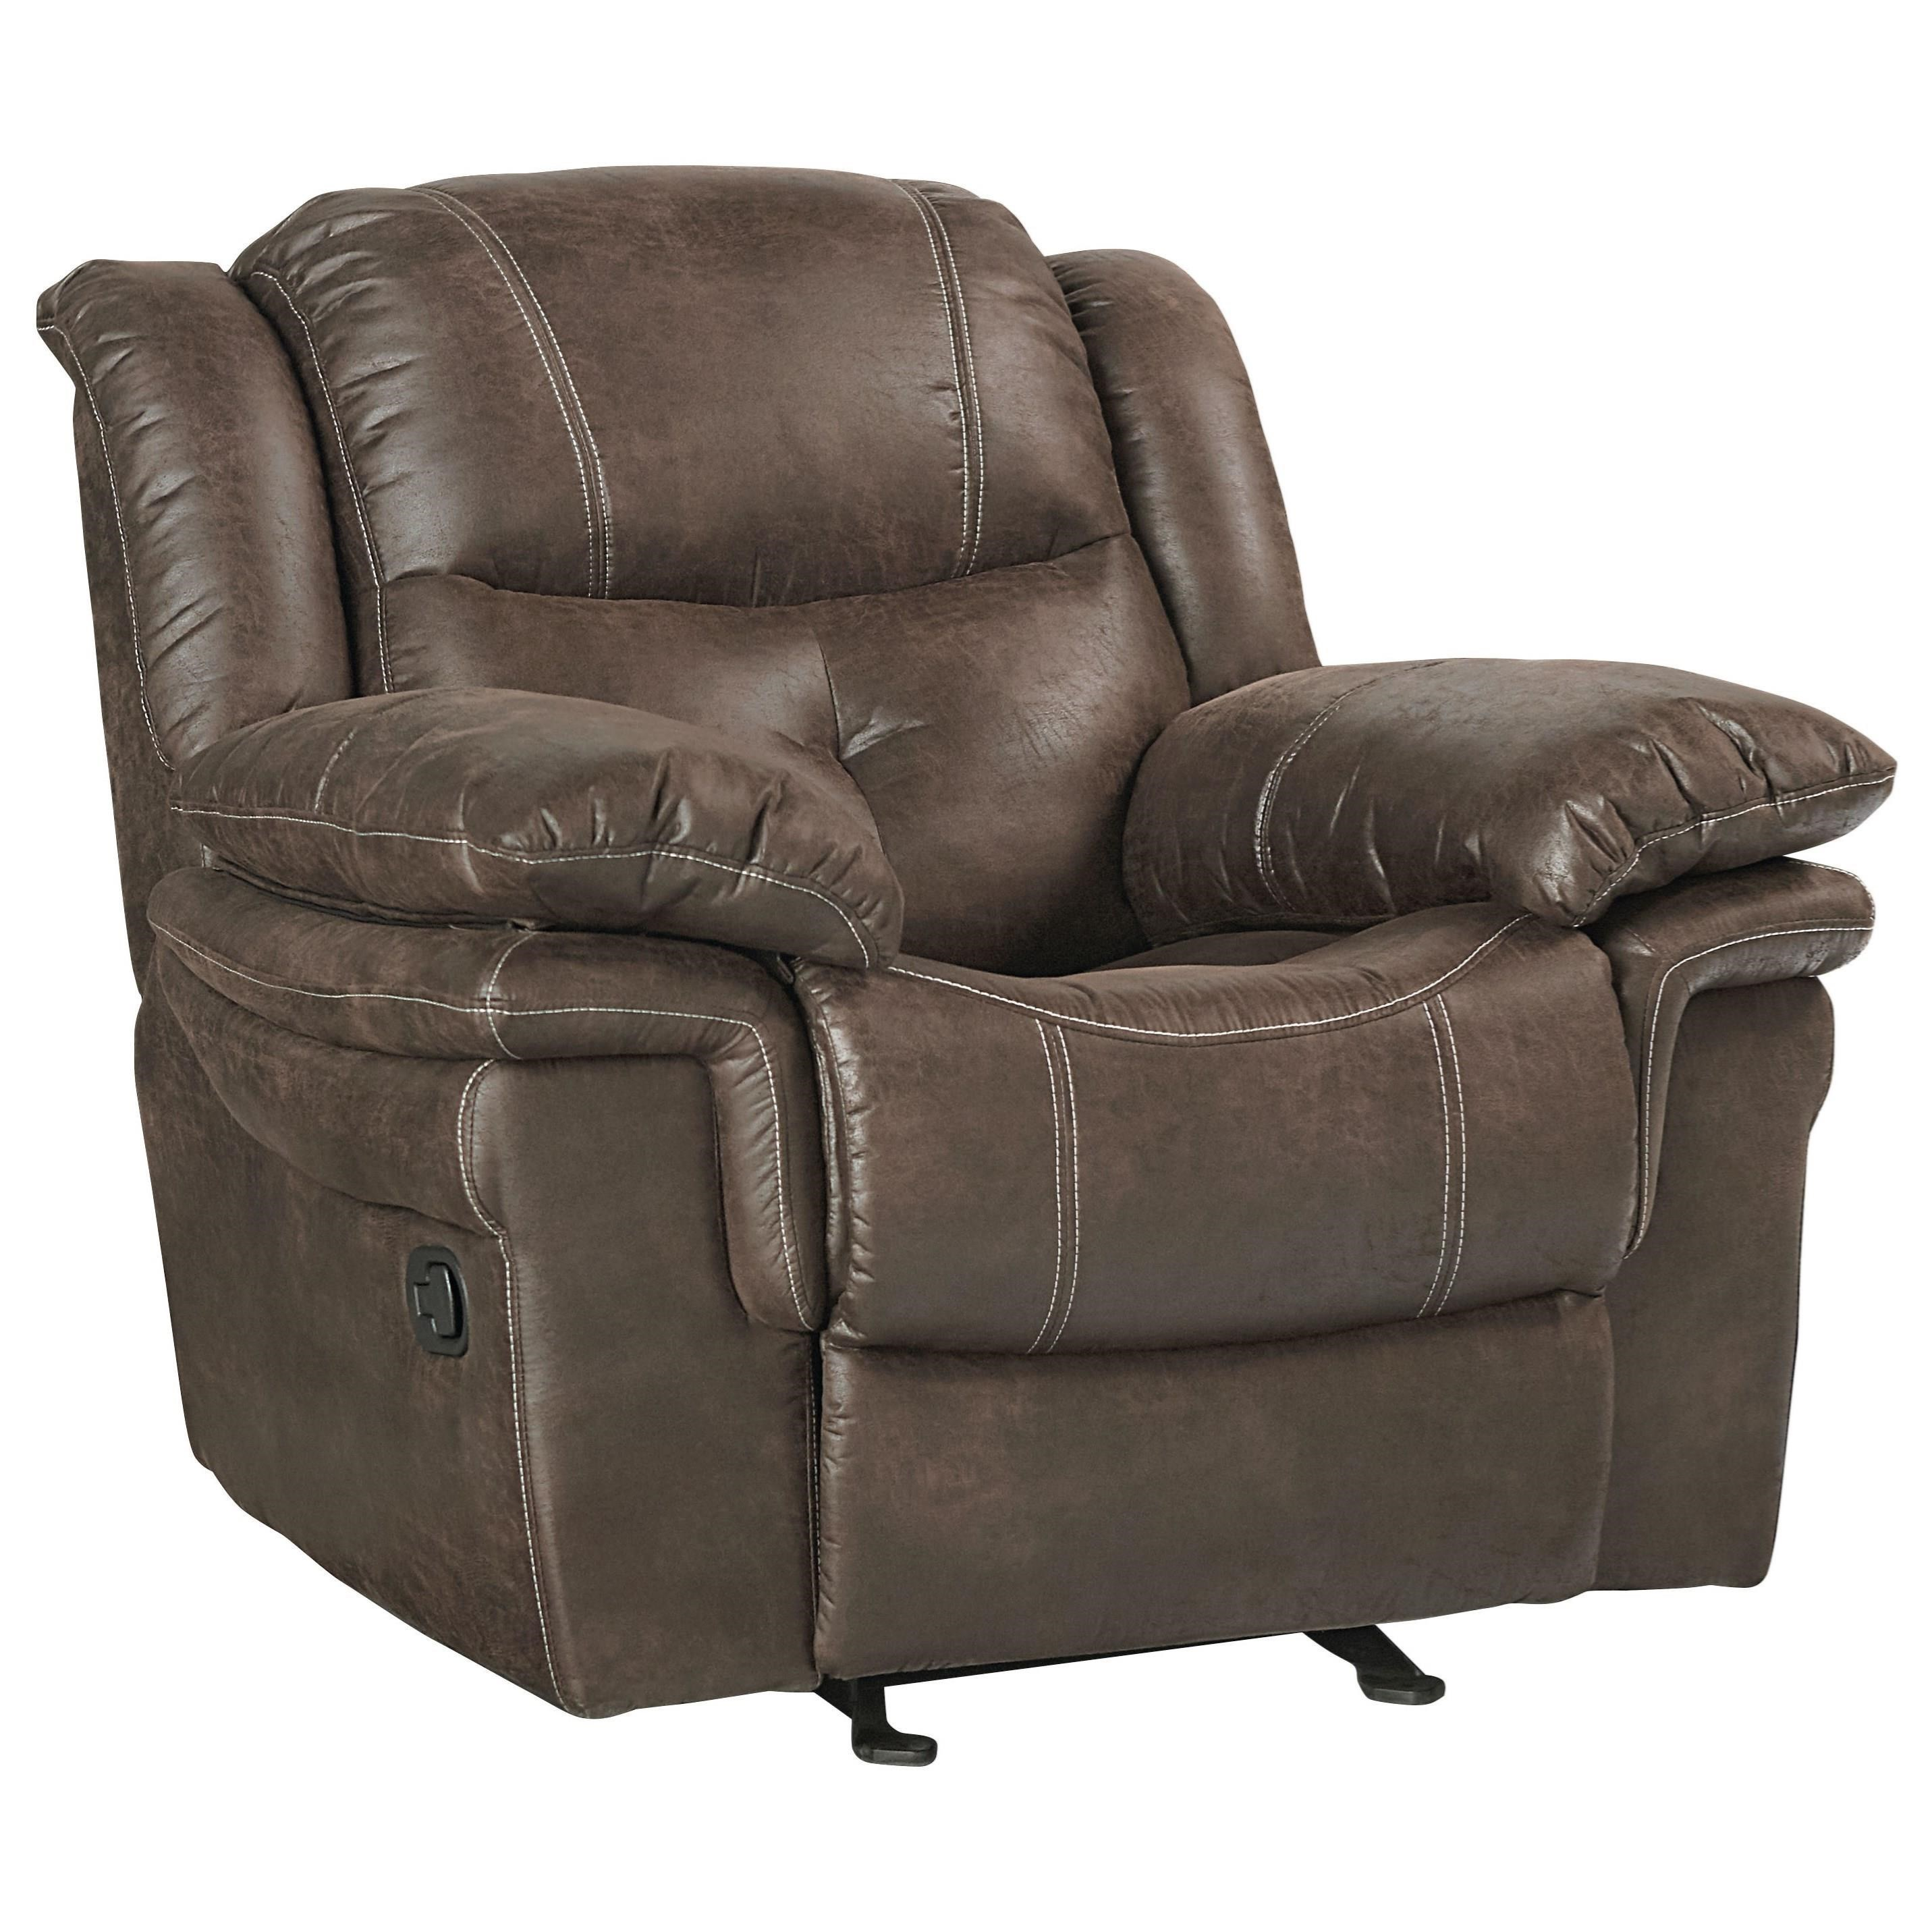 Standard Furniture Huxford Recliner - Item Number: 4007982